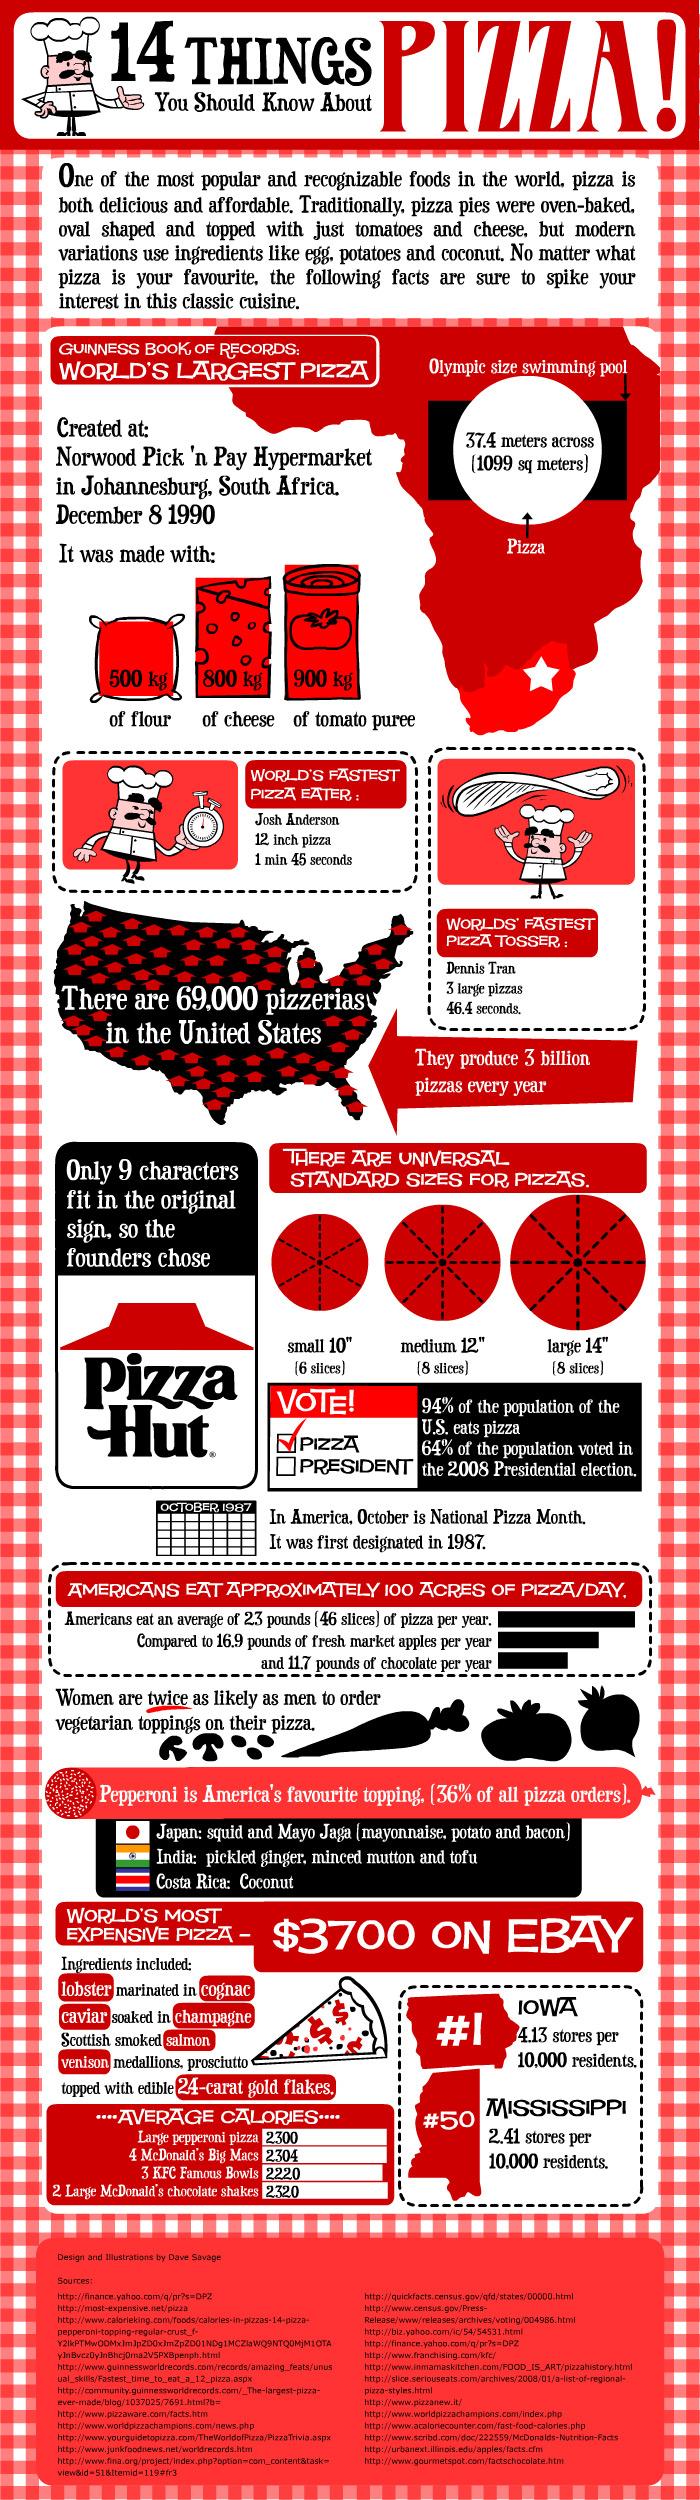 350 Catchy Pizza Restaurant Names - BrandonGaille com